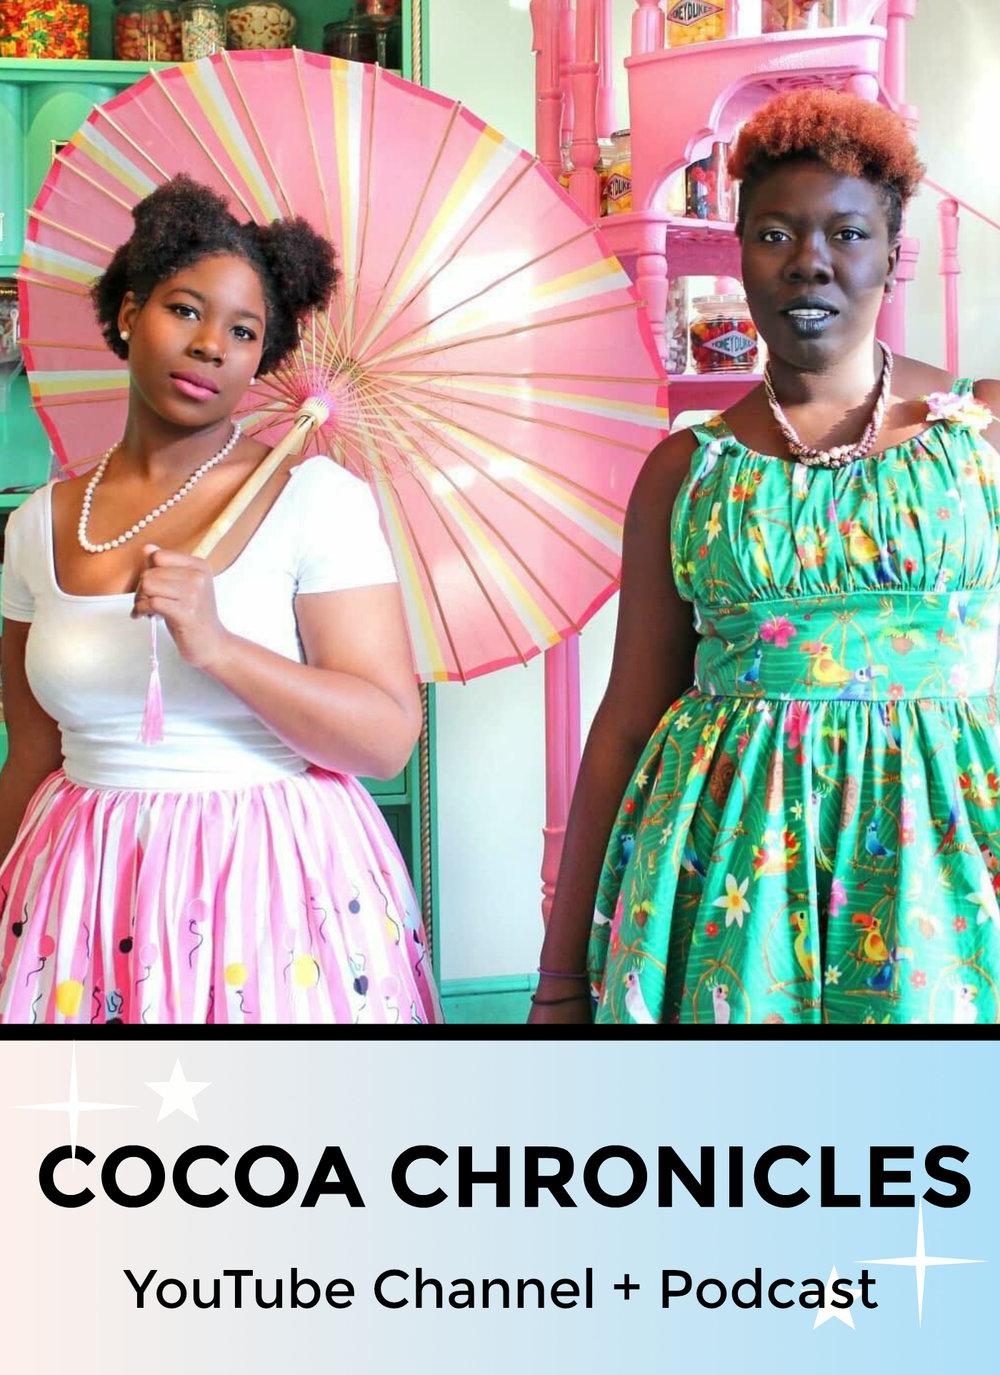 qc-cocoa.jpg